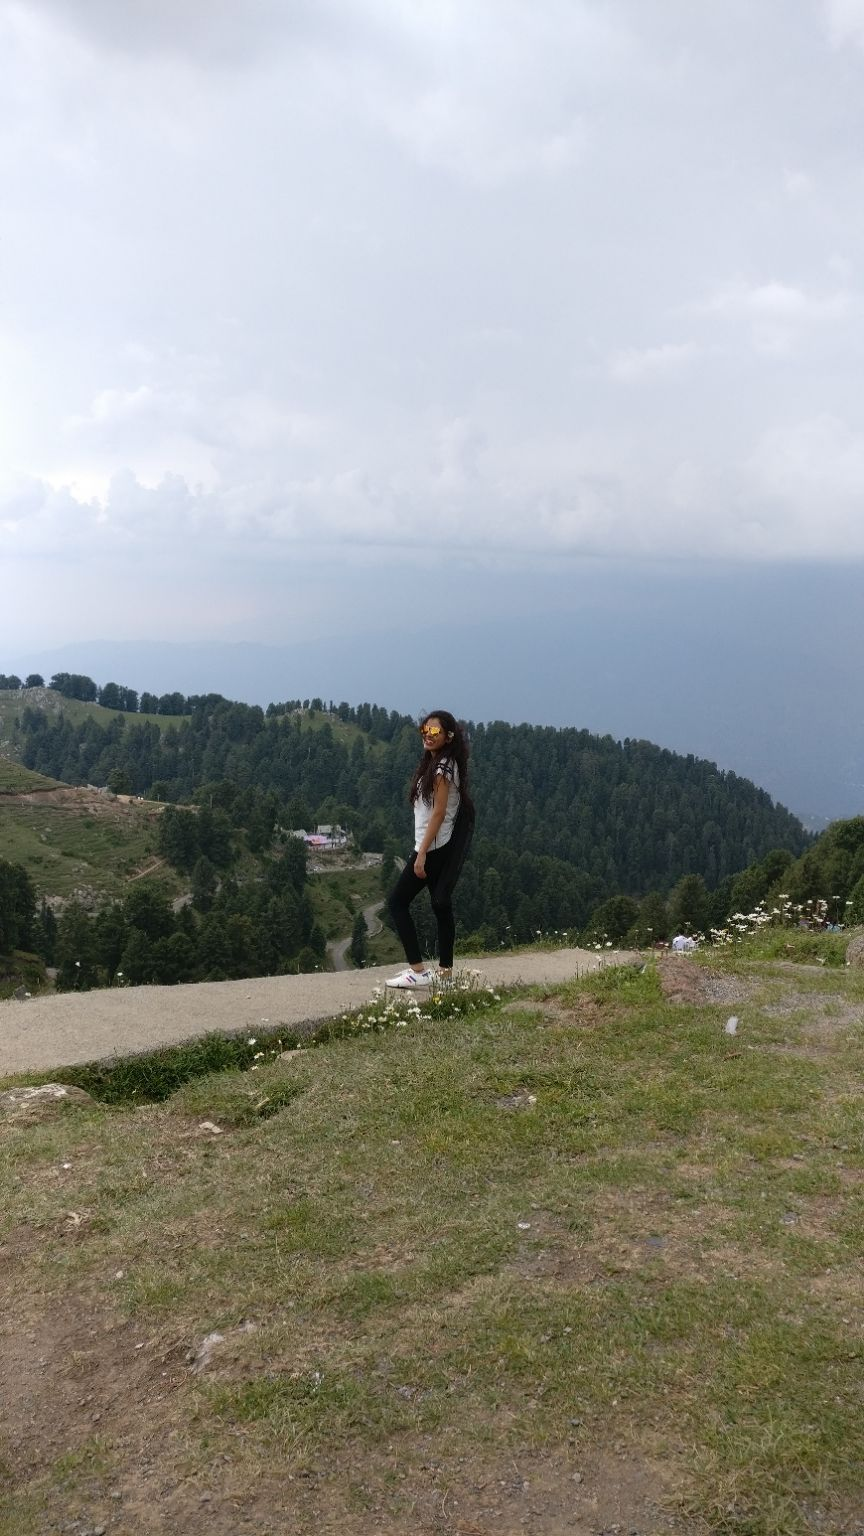 Photo of Dainkund Peak By bhawna sain